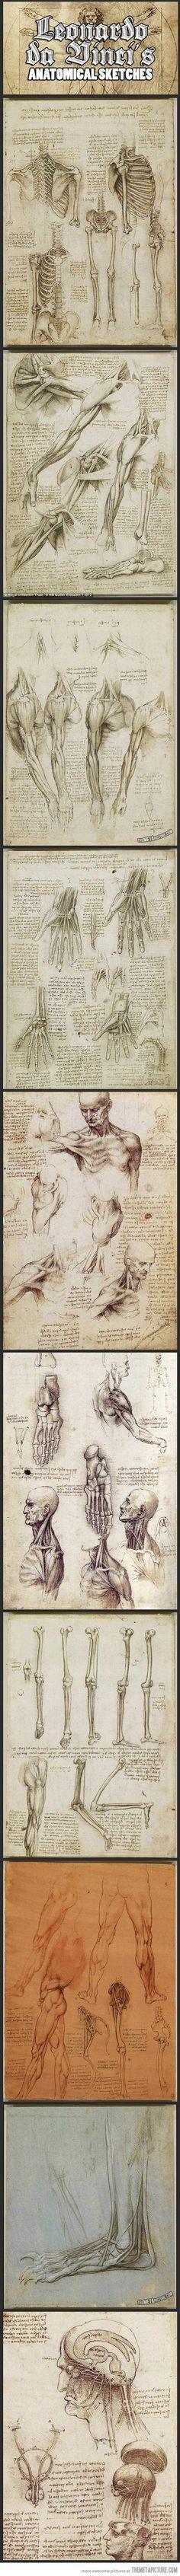 Leonardo da Vinci's anatomical sketches…